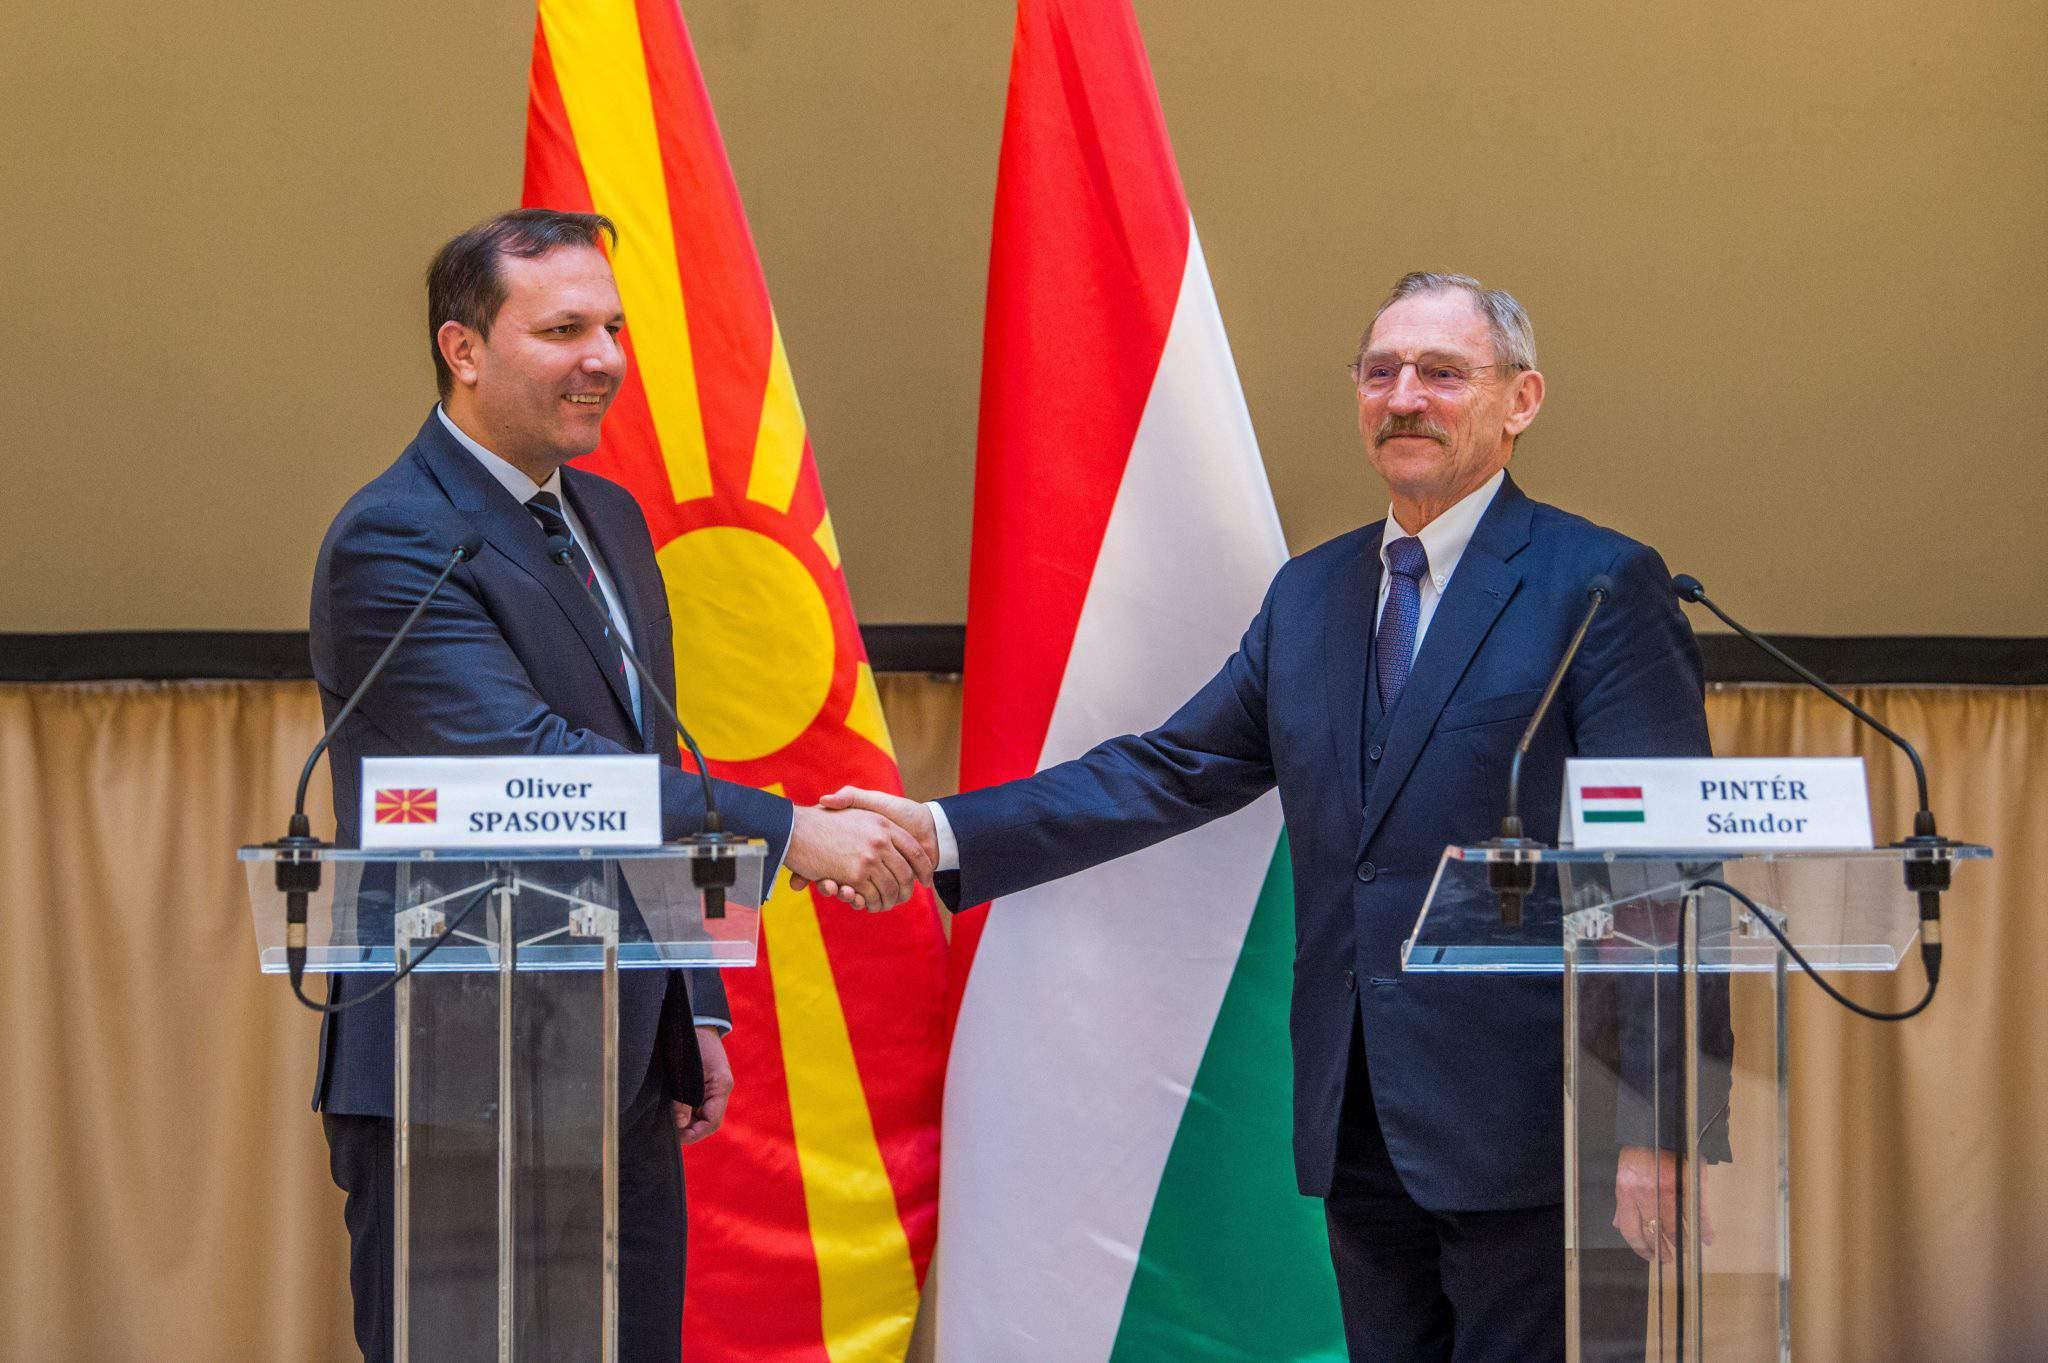 macedonia hungary pintér sándor police